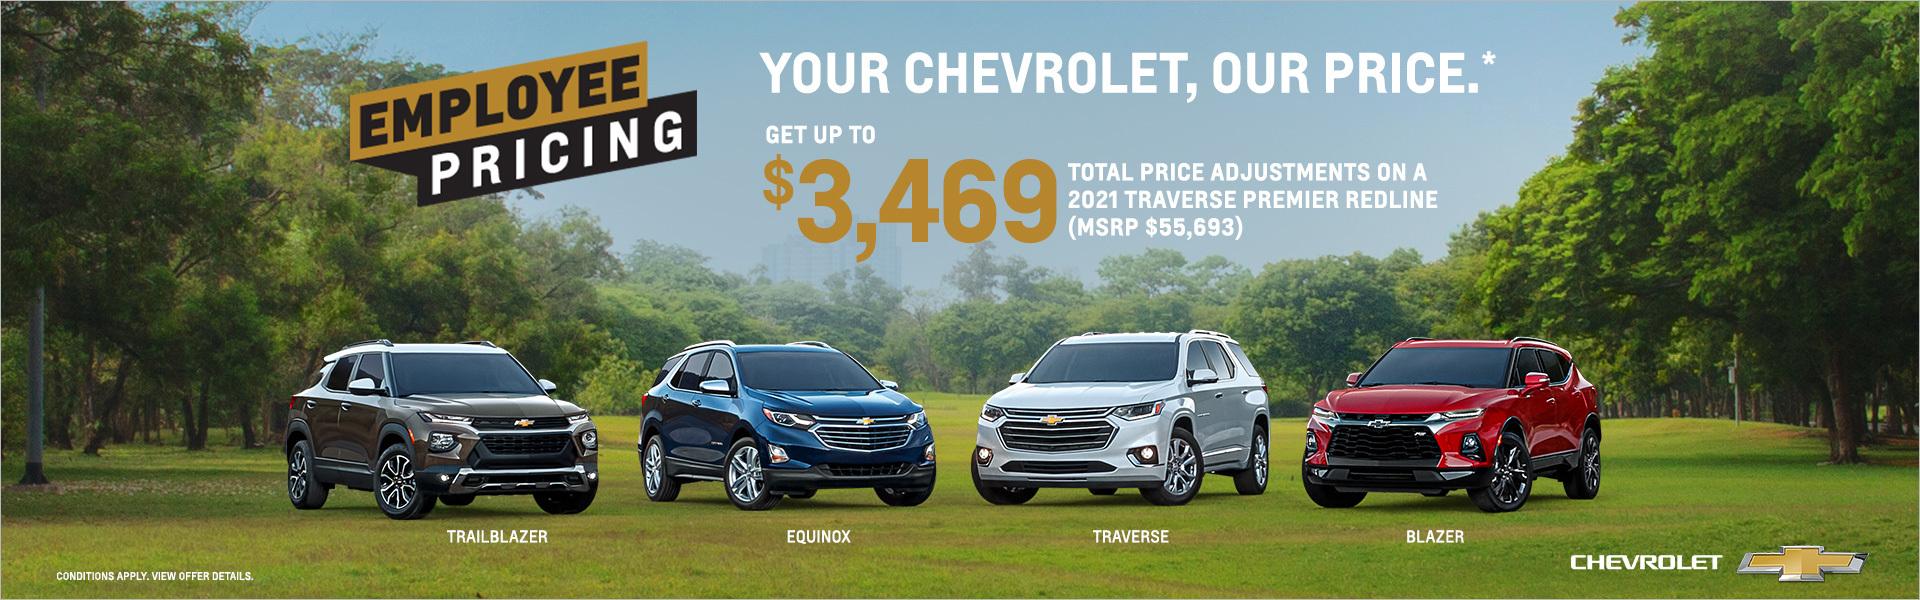 GM Employee Pricing